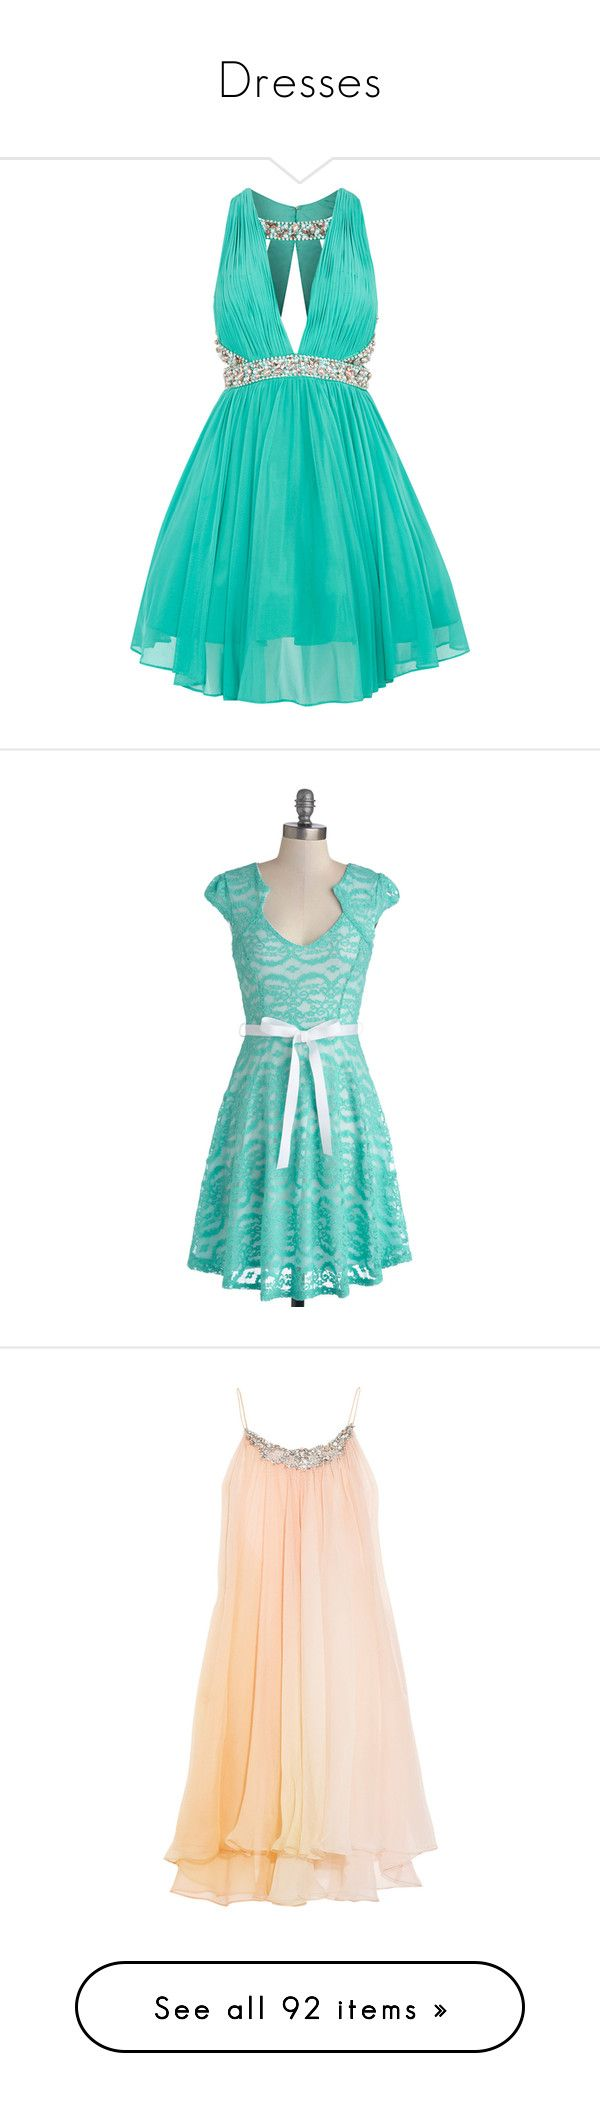 """Dresses"" by sarahmartins ❤ liked on Polyvore featuring dresses, vestidos, short dresses, formal dress, prom dresses, green dress, formal cocktail dresses, short prom dresses, short green dress and plus size women's fashion"